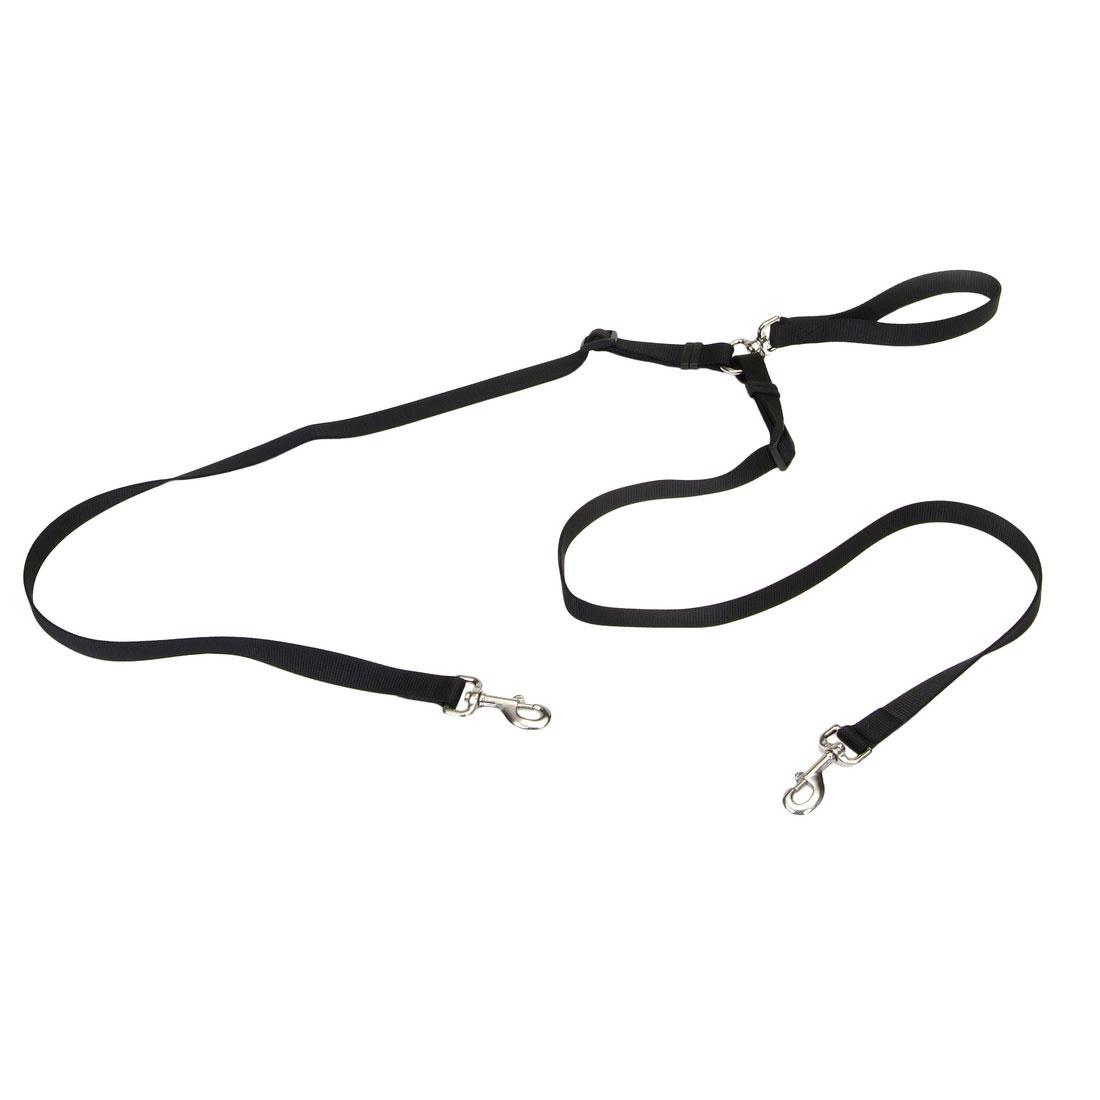 Coastal Two Dog Walker Tangle-Free Adjustable Dog Leash, Black, 5/8-in x 4-ft